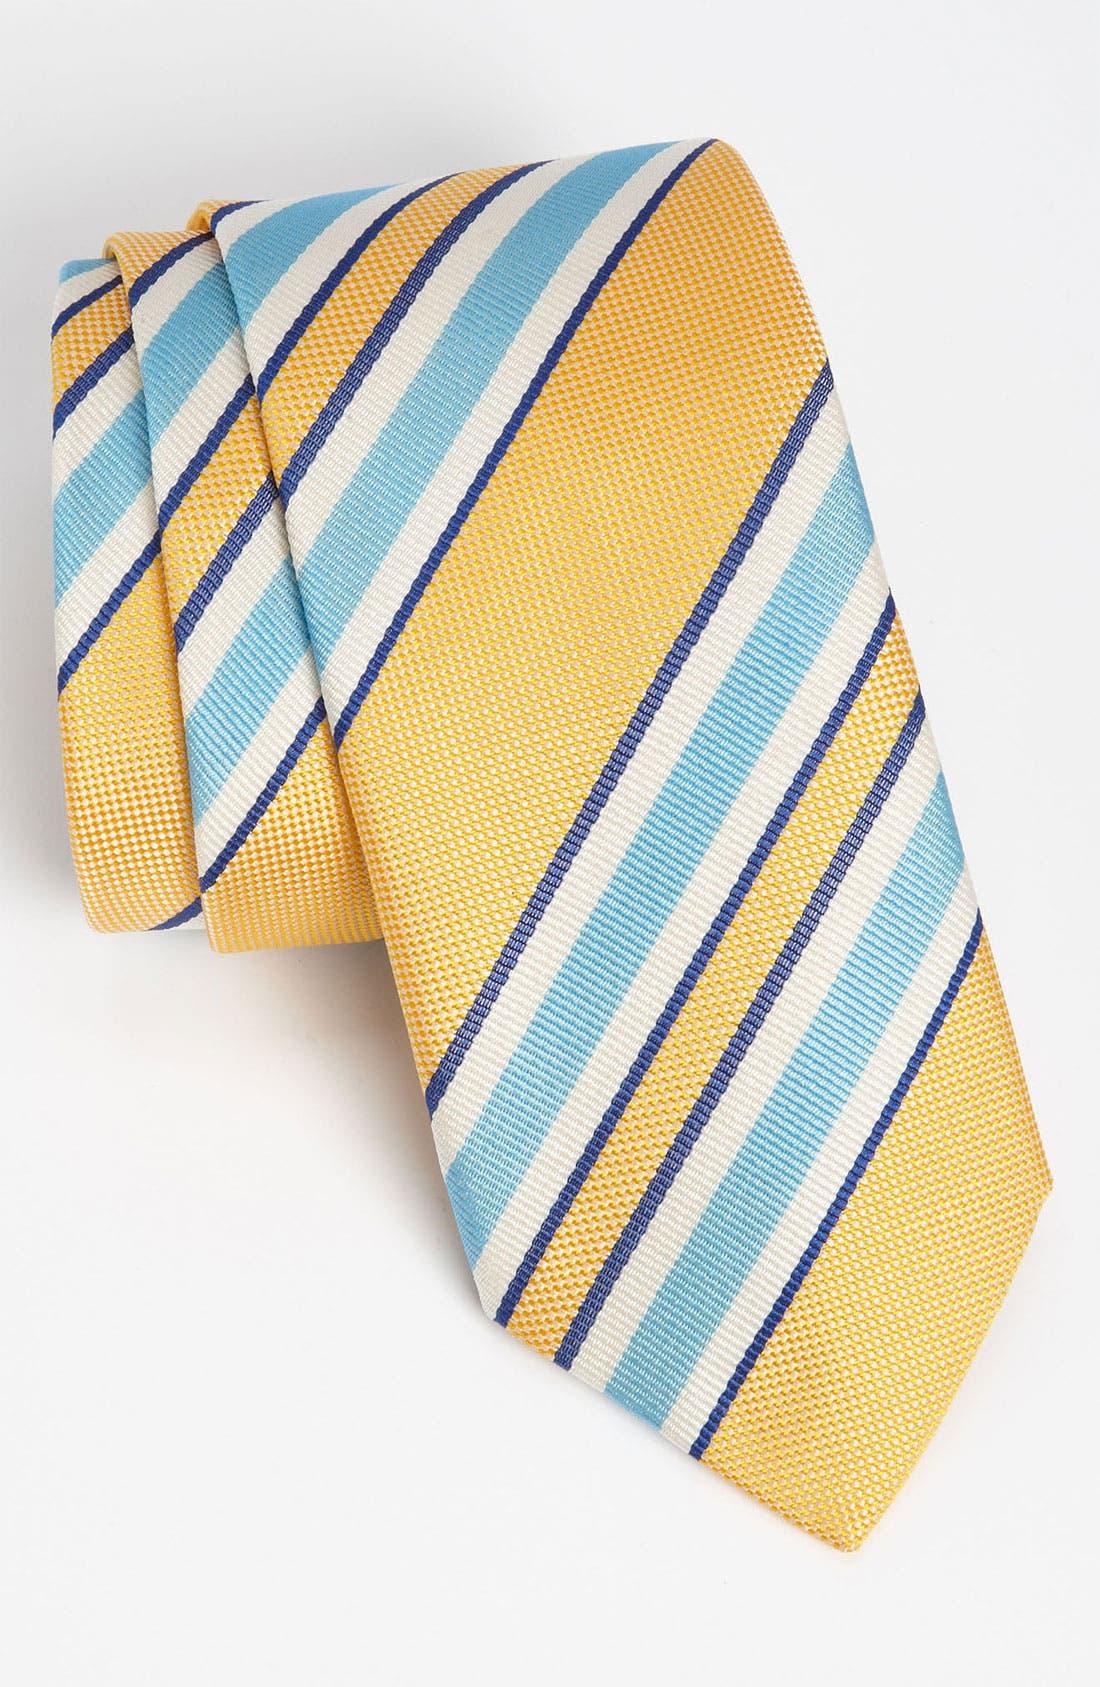 Alternate Image 1 Selected - Thomas Pink 'Ramsay Stripe' Woven Silk Tie